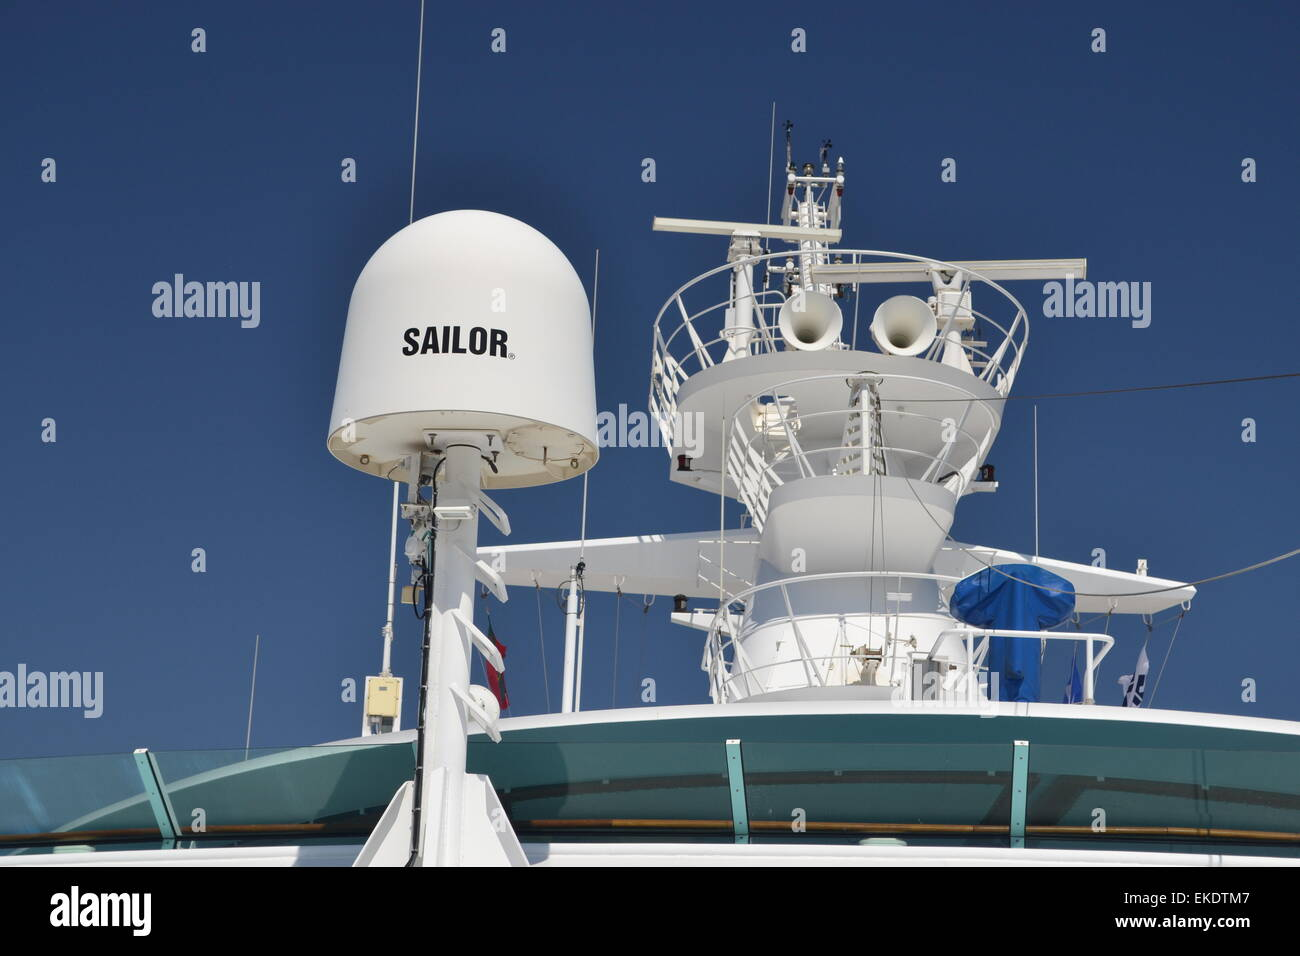 Cobham Sailor Ku-band satellite TV antenna on board a ship. - Stock Image